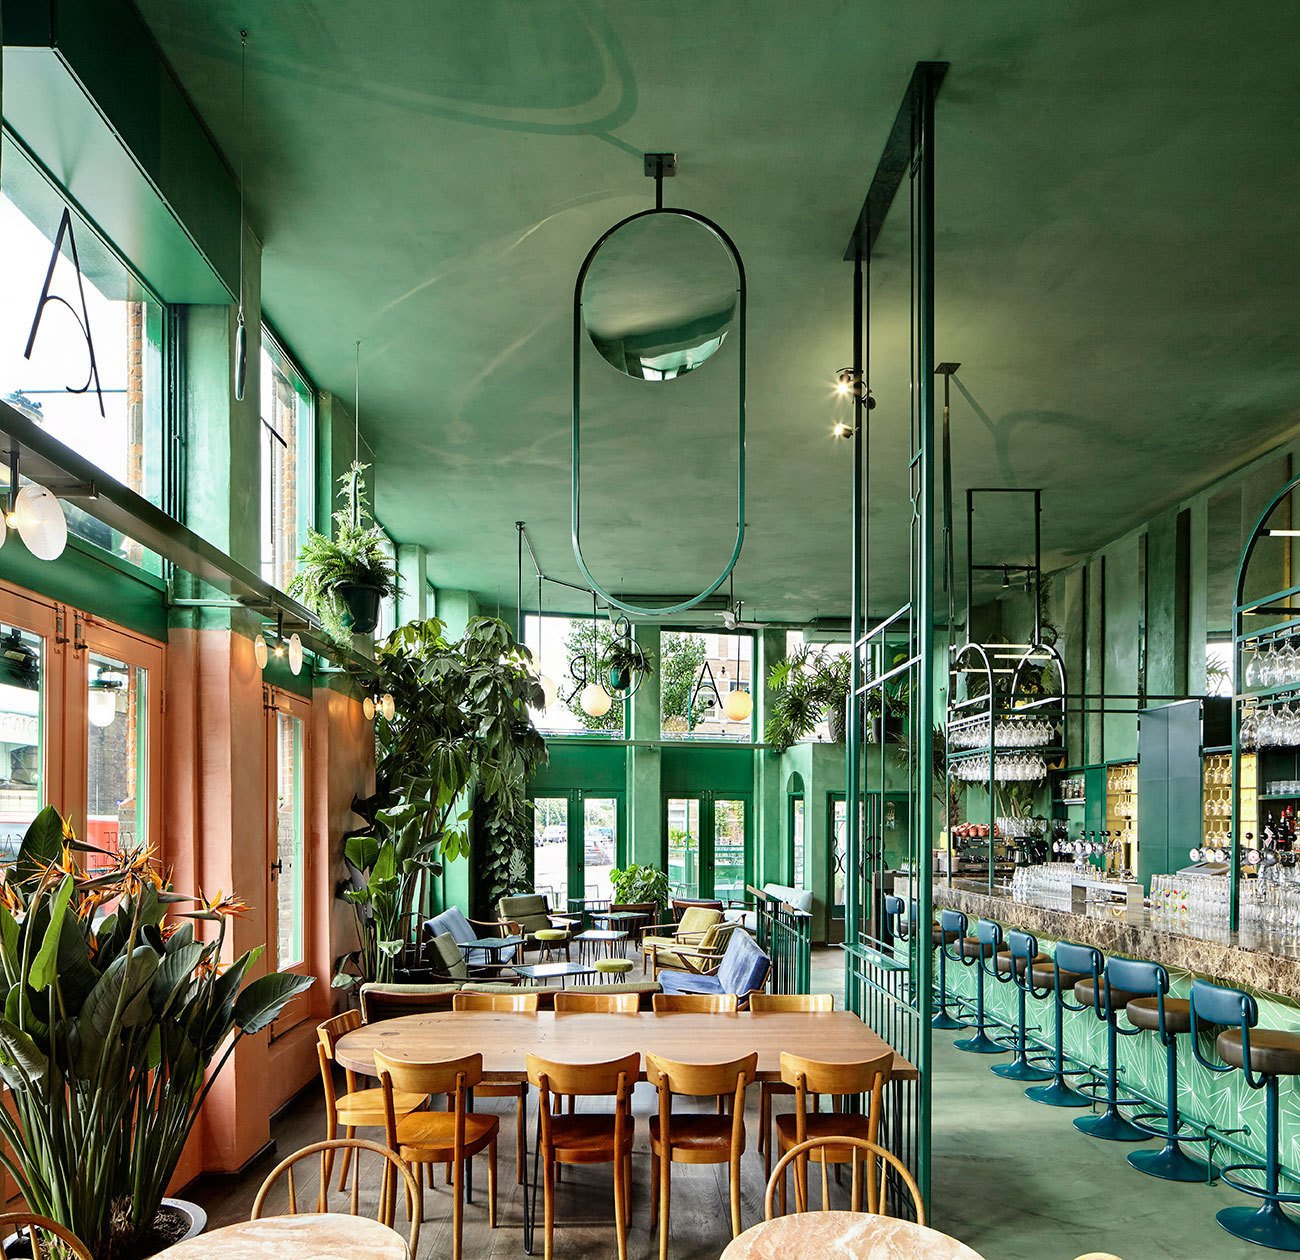 BAR BOTANIQUE IN AMSTERDAM BY STUDIO MODIJEFSKY.  Lush Life from Restaurants